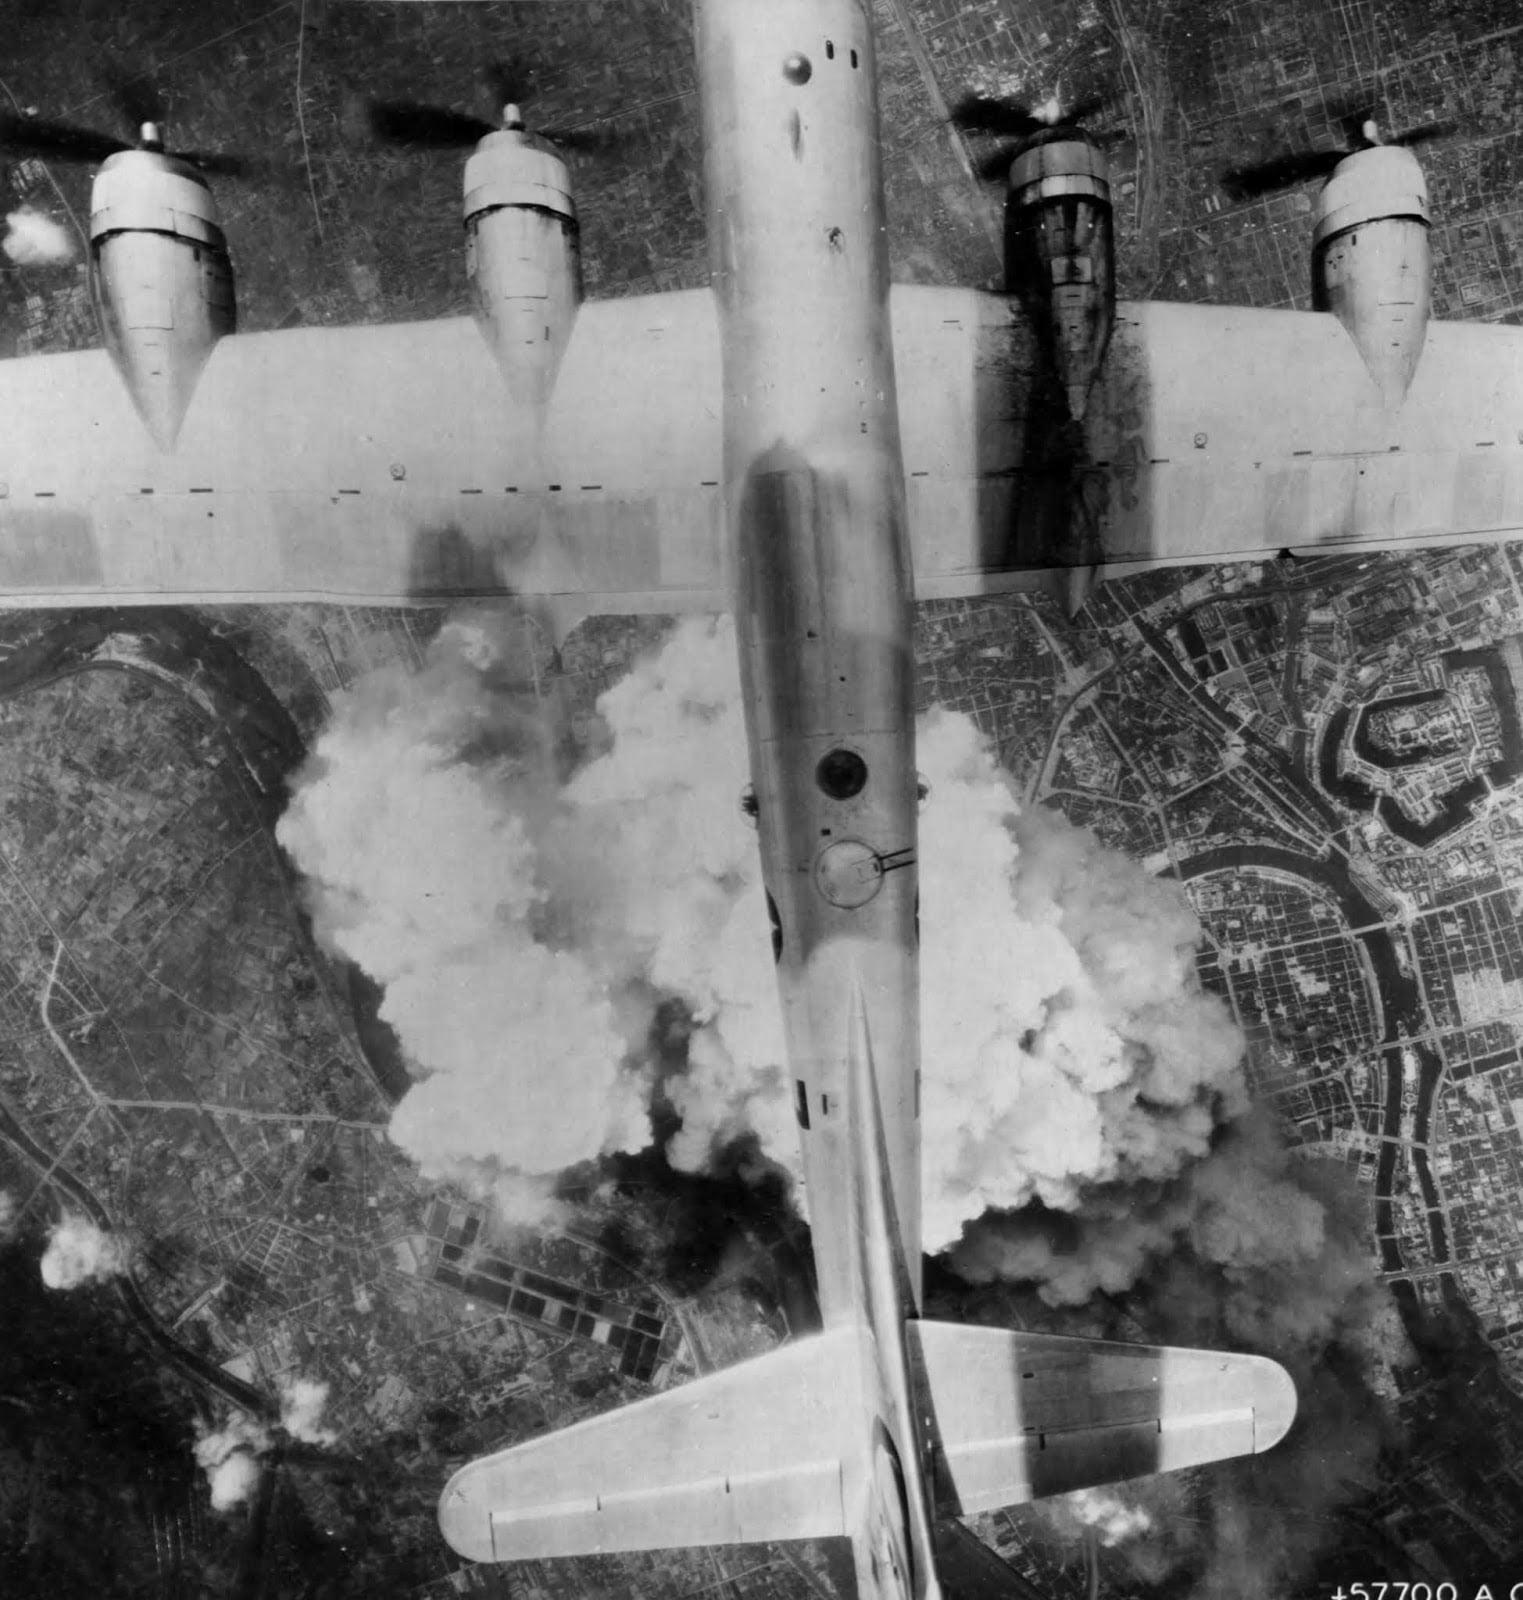 Target Tokyo: Η «πύρινη θύελλα» που συντόμευσε τον πόλεμο;